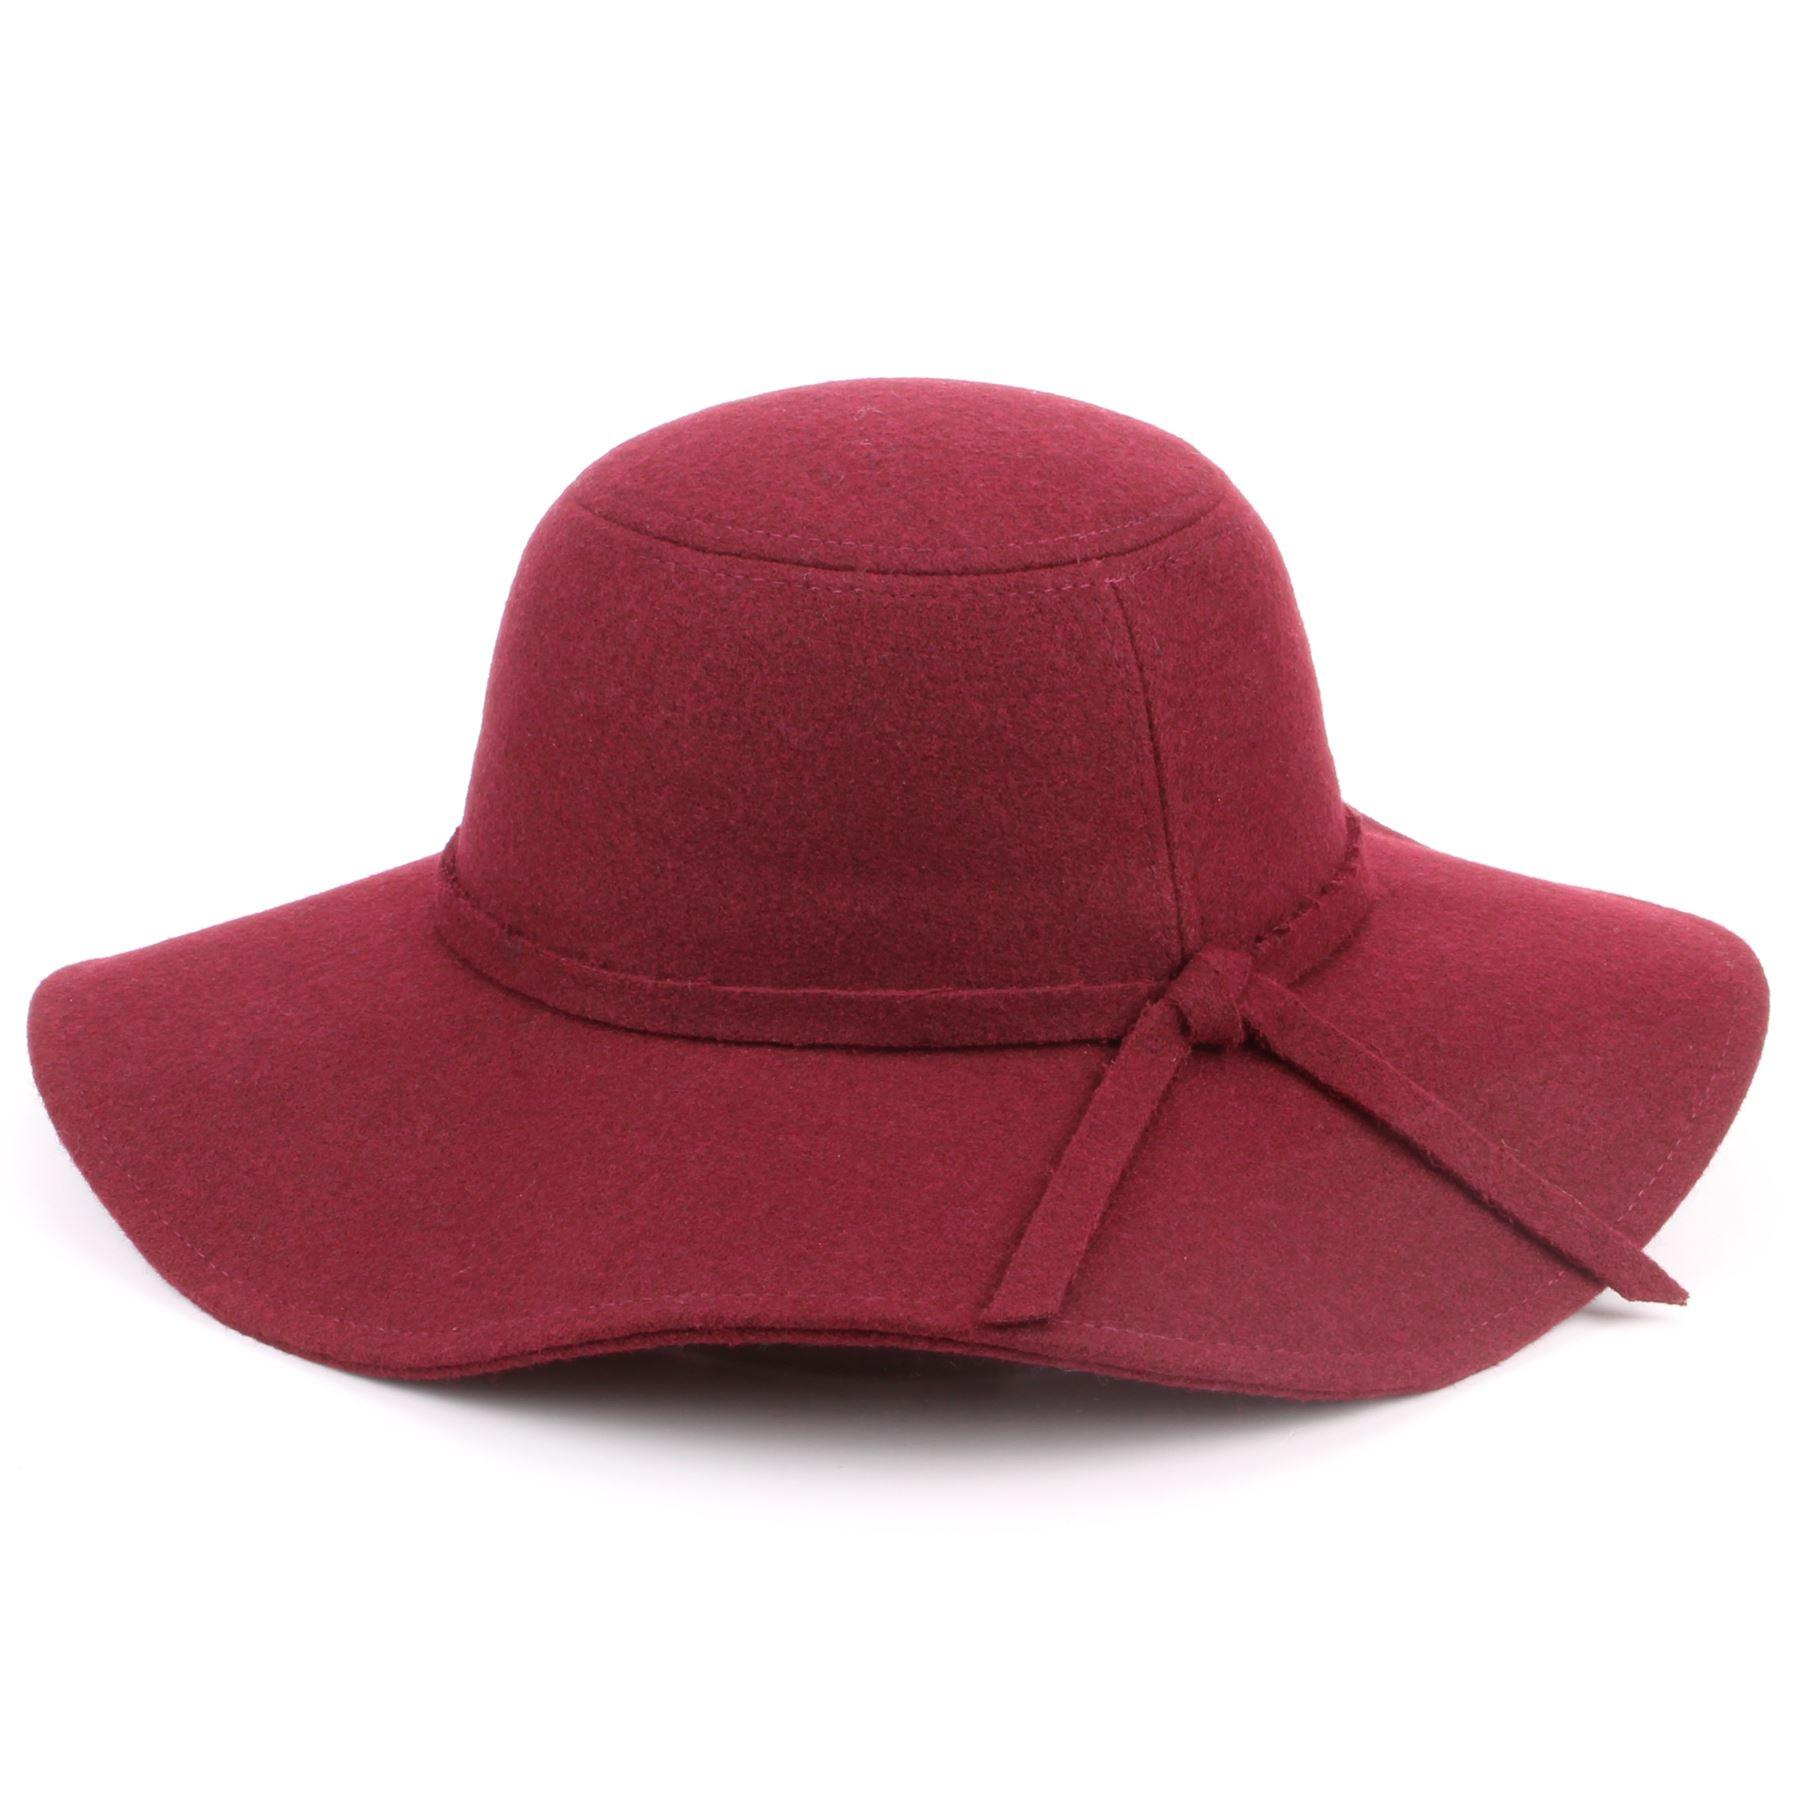 a03c6120f03ea Details about Wool Felt Floppy Hat Wide Brim Hawkins Cloche Fedora Cap  Cloche Ladies